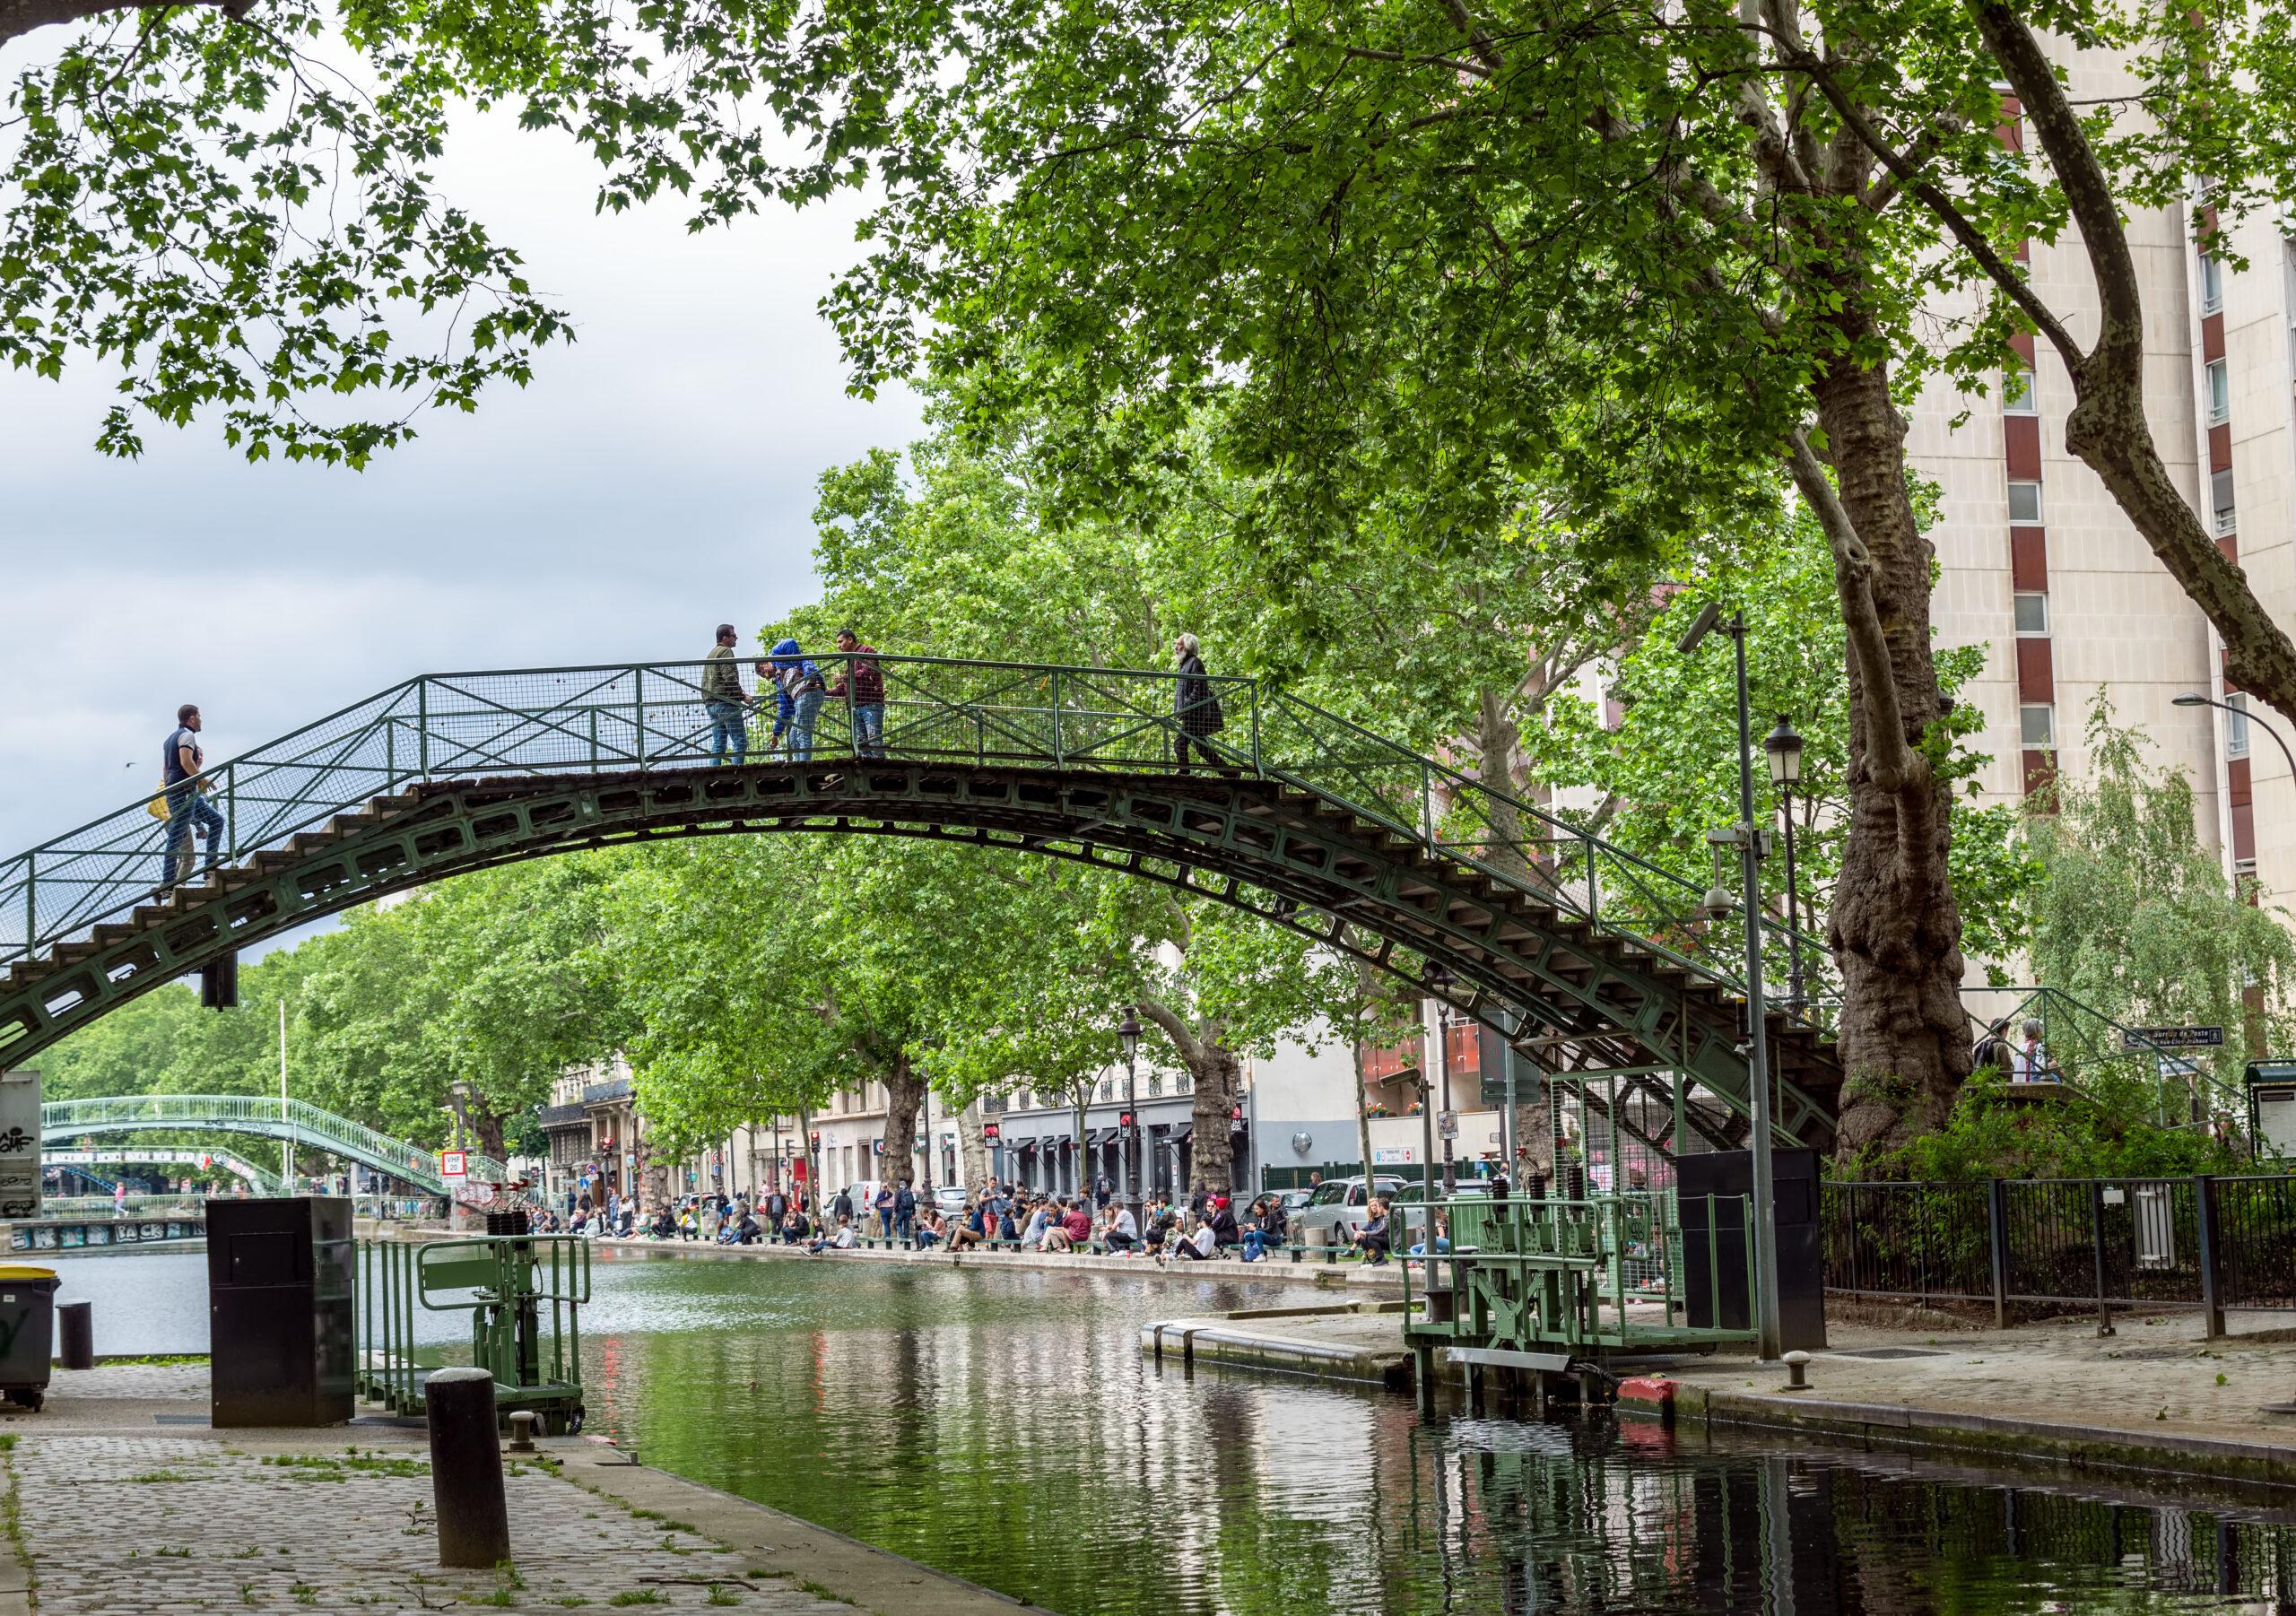 Canal Saint Martin Paris attraksjon gatur elvekanal kanal kjent severdighet